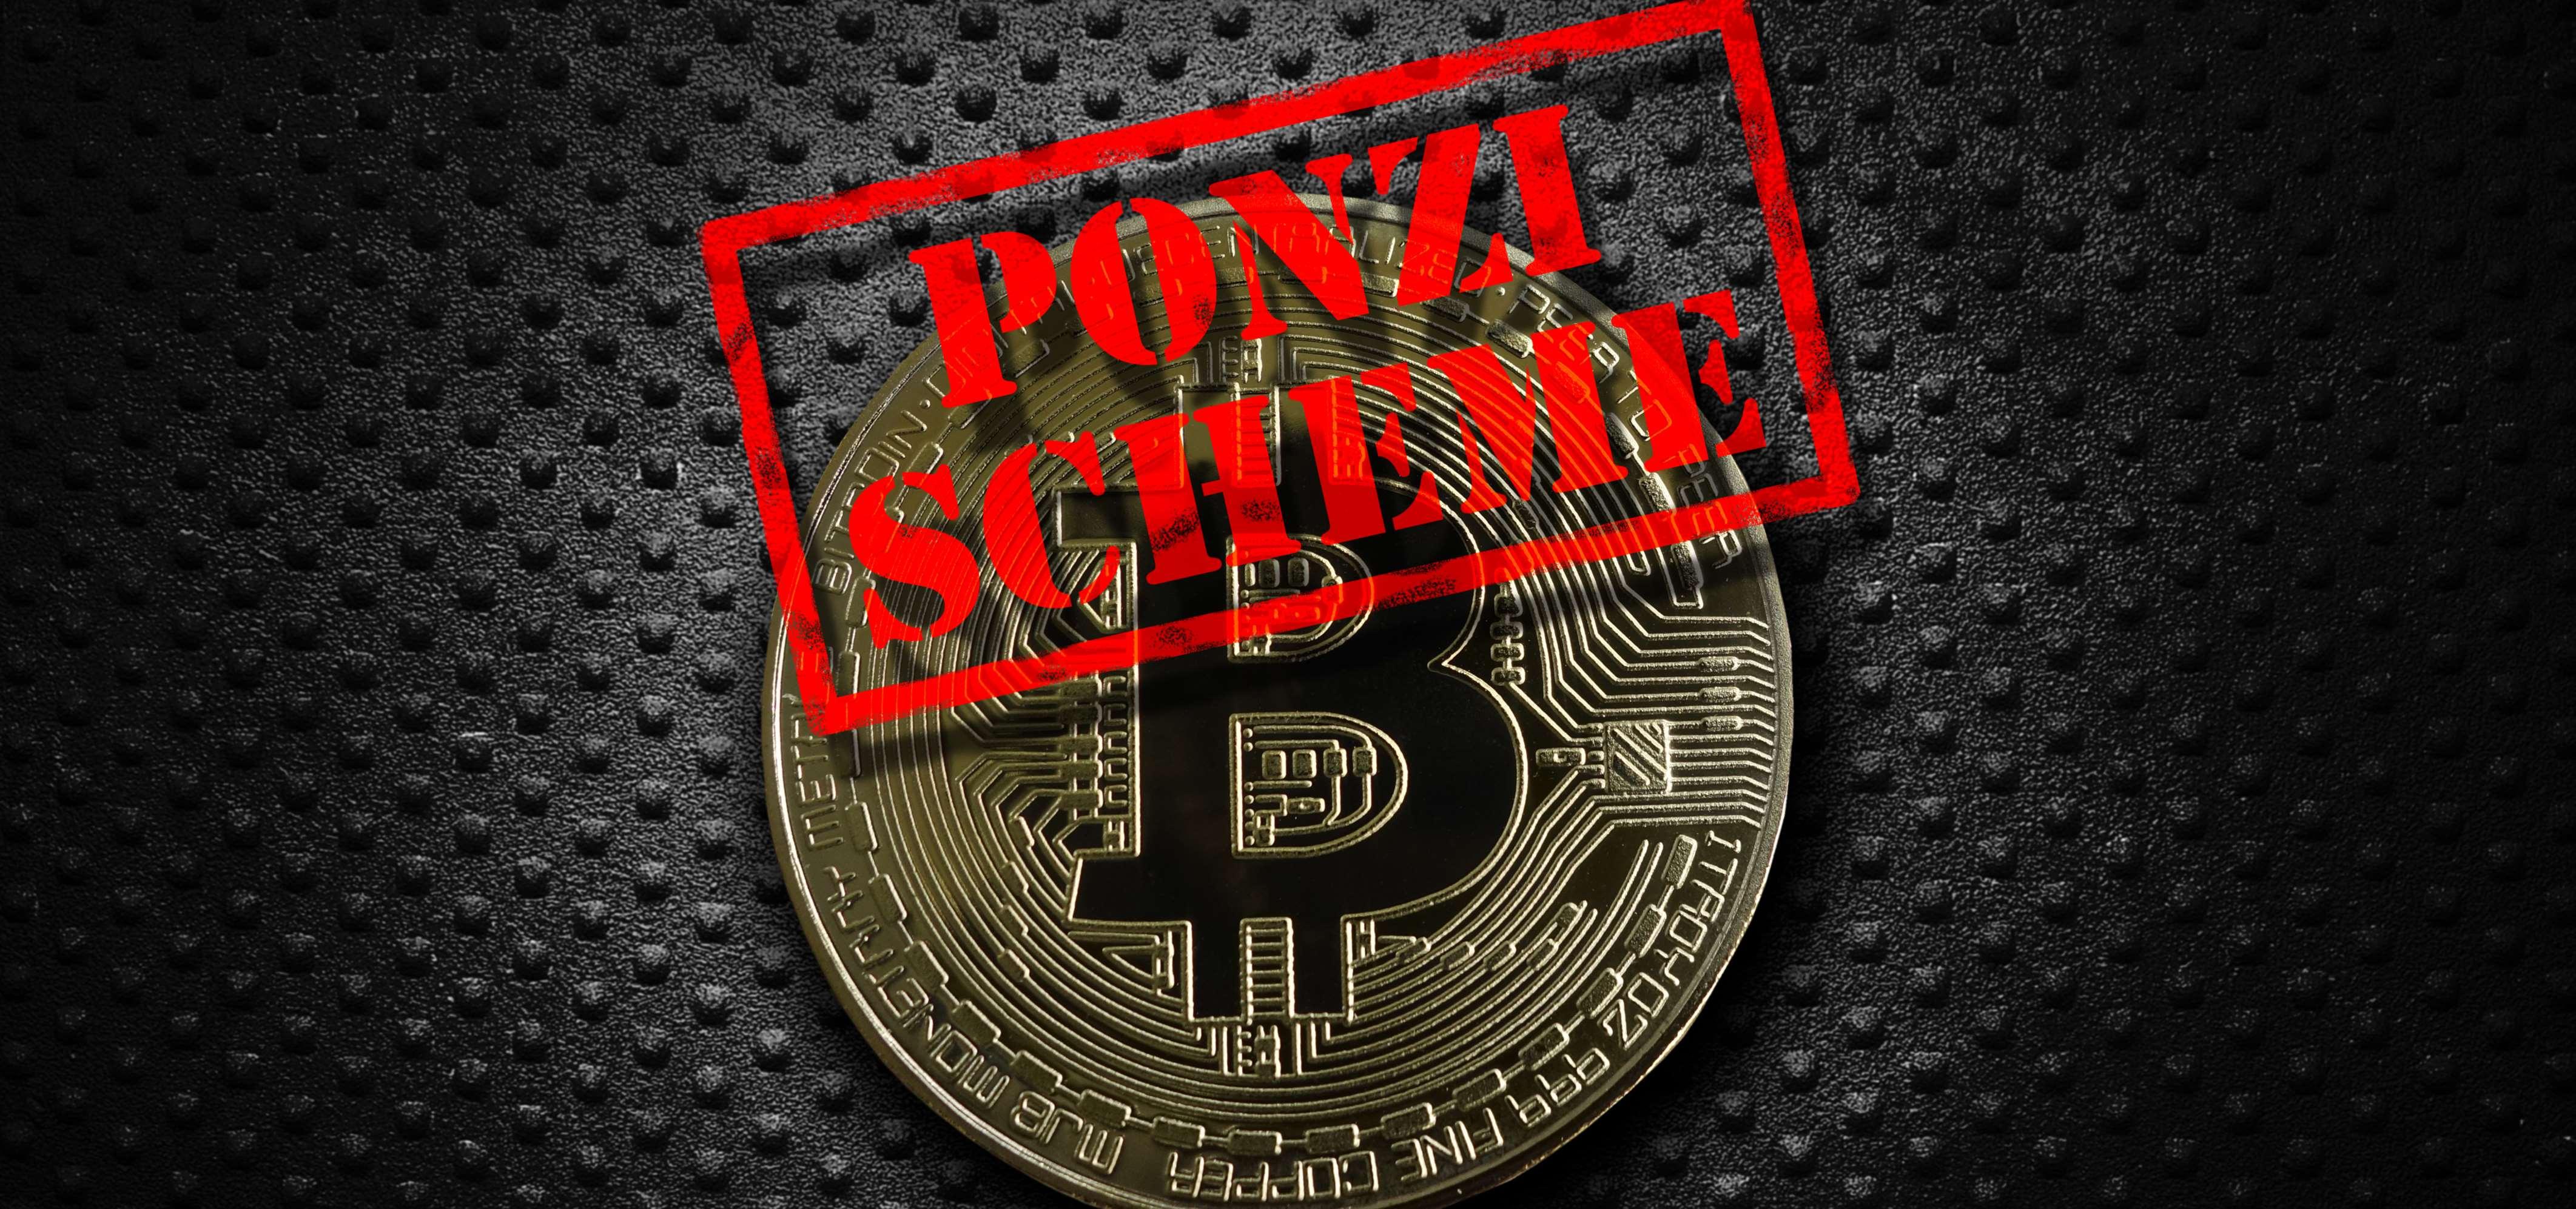 Cloud Mining Ponzi Scheme